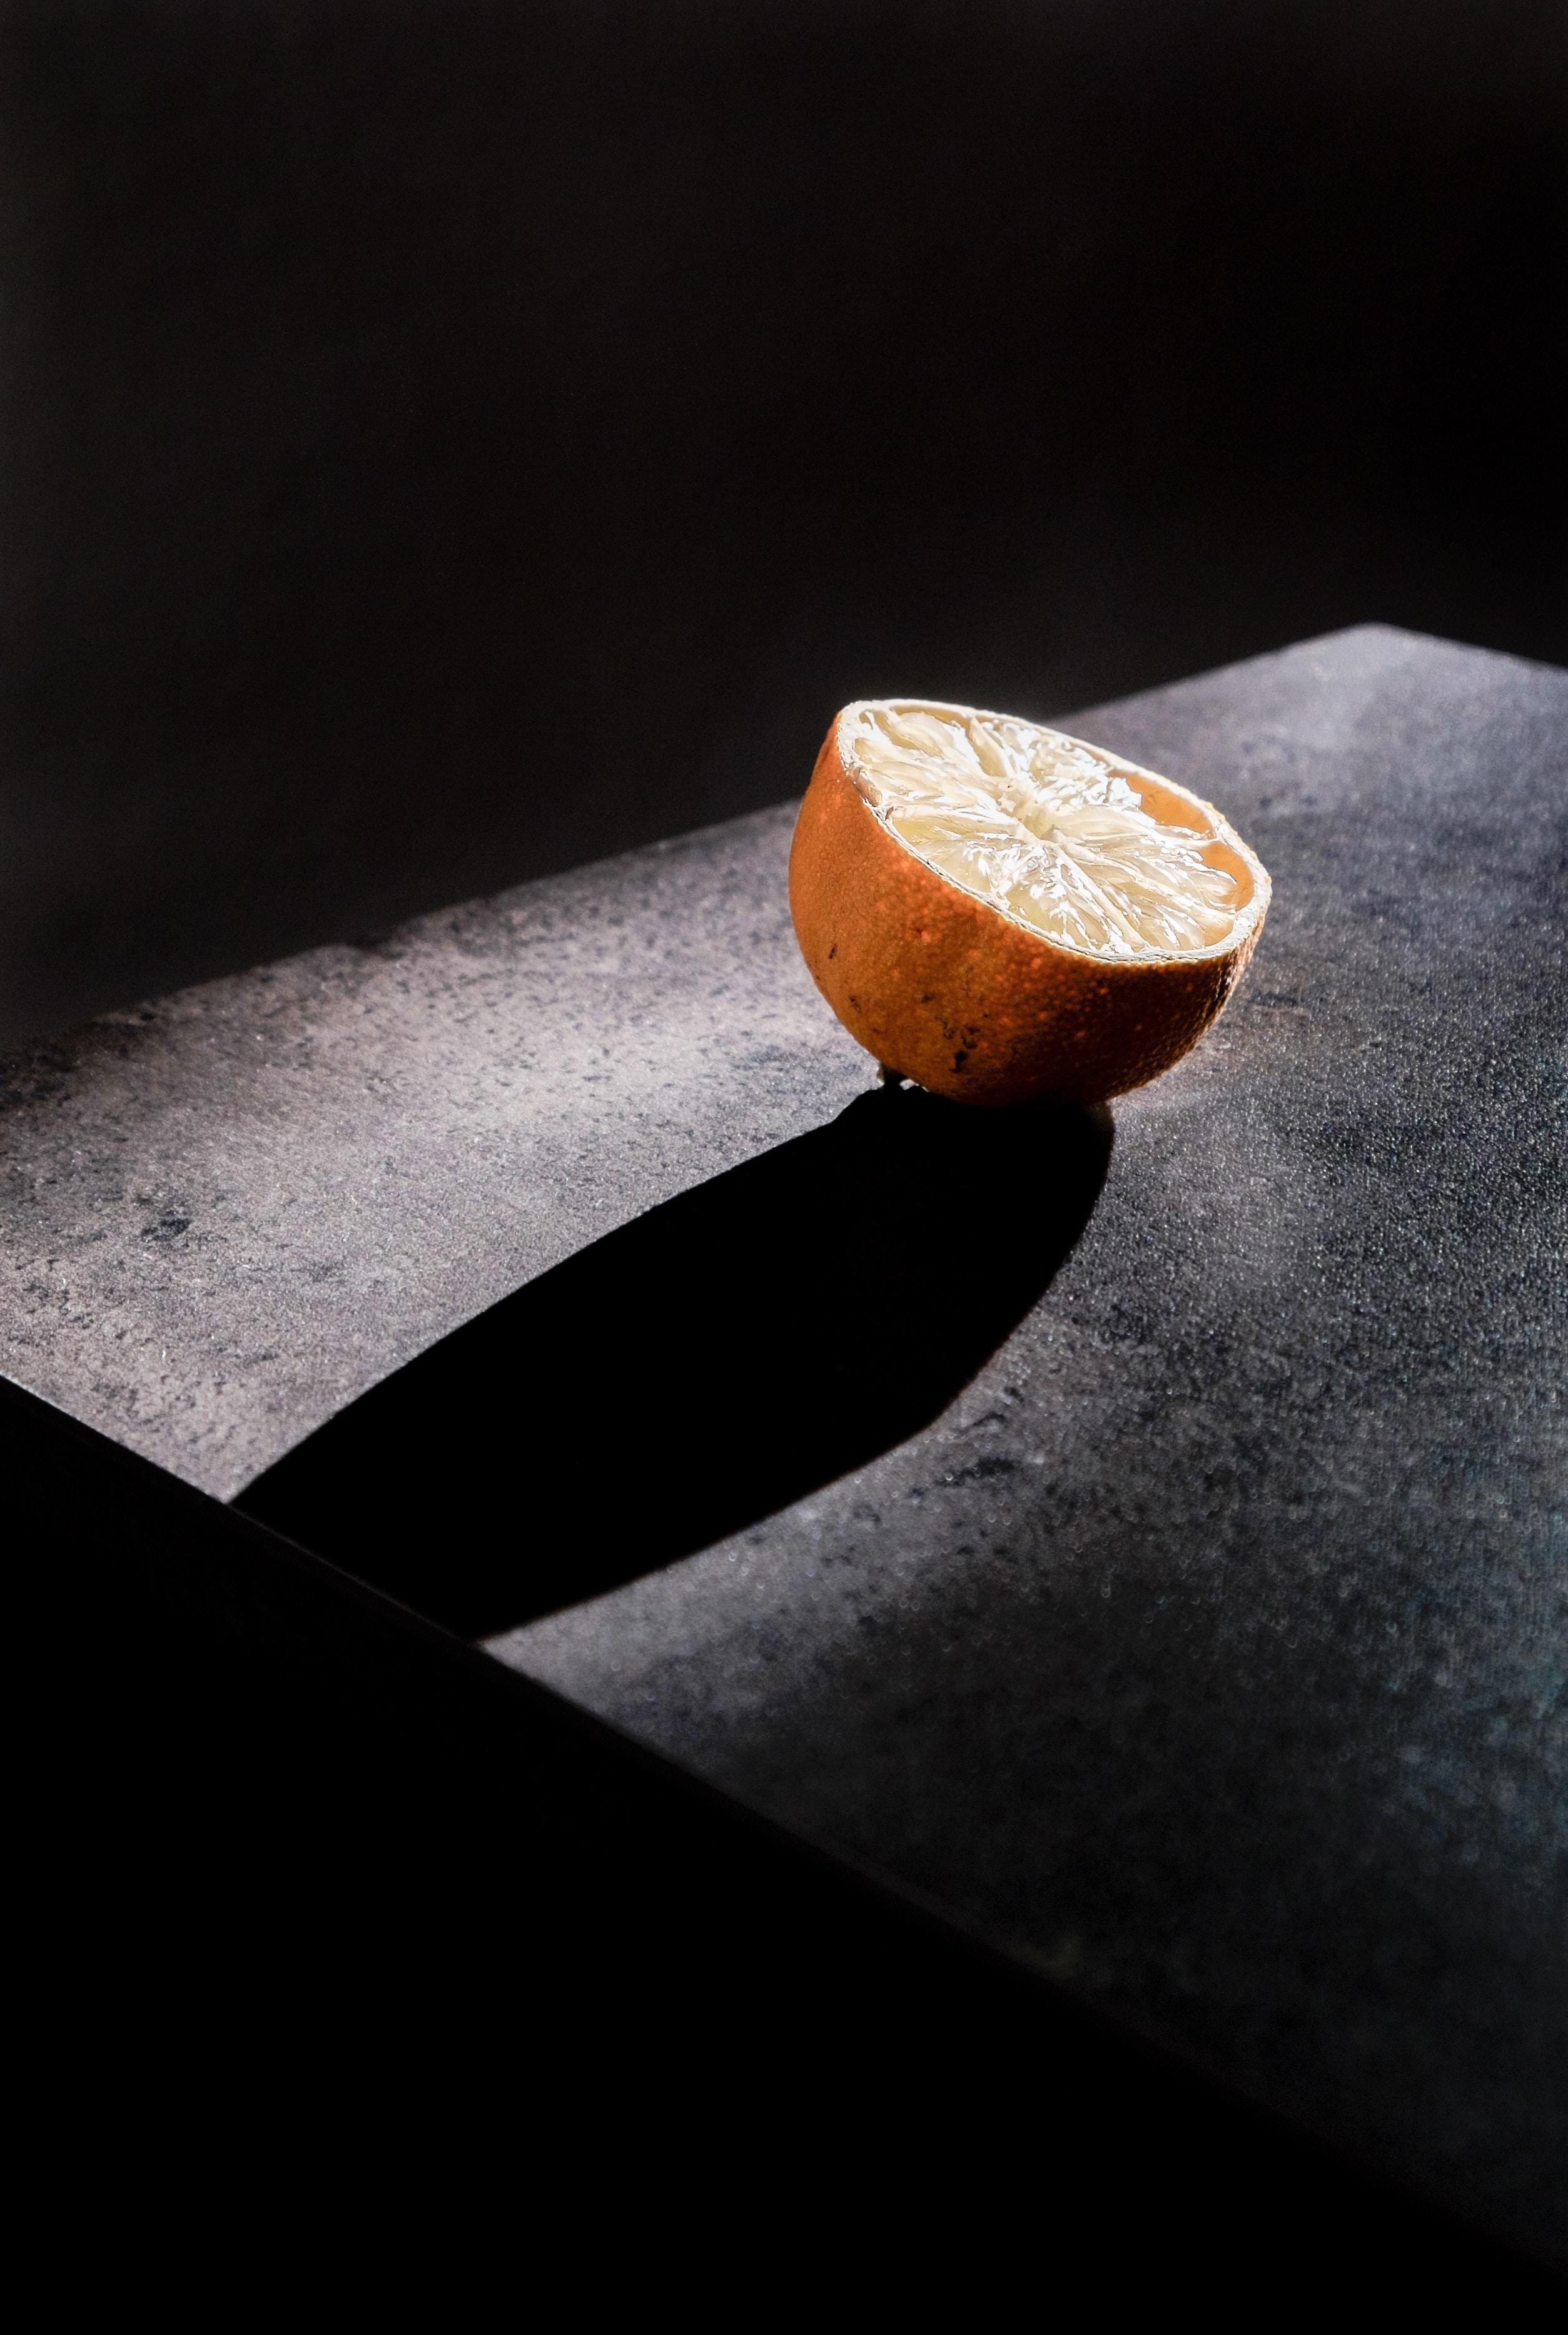 A half of a lemon casting a long shadow on a black surface